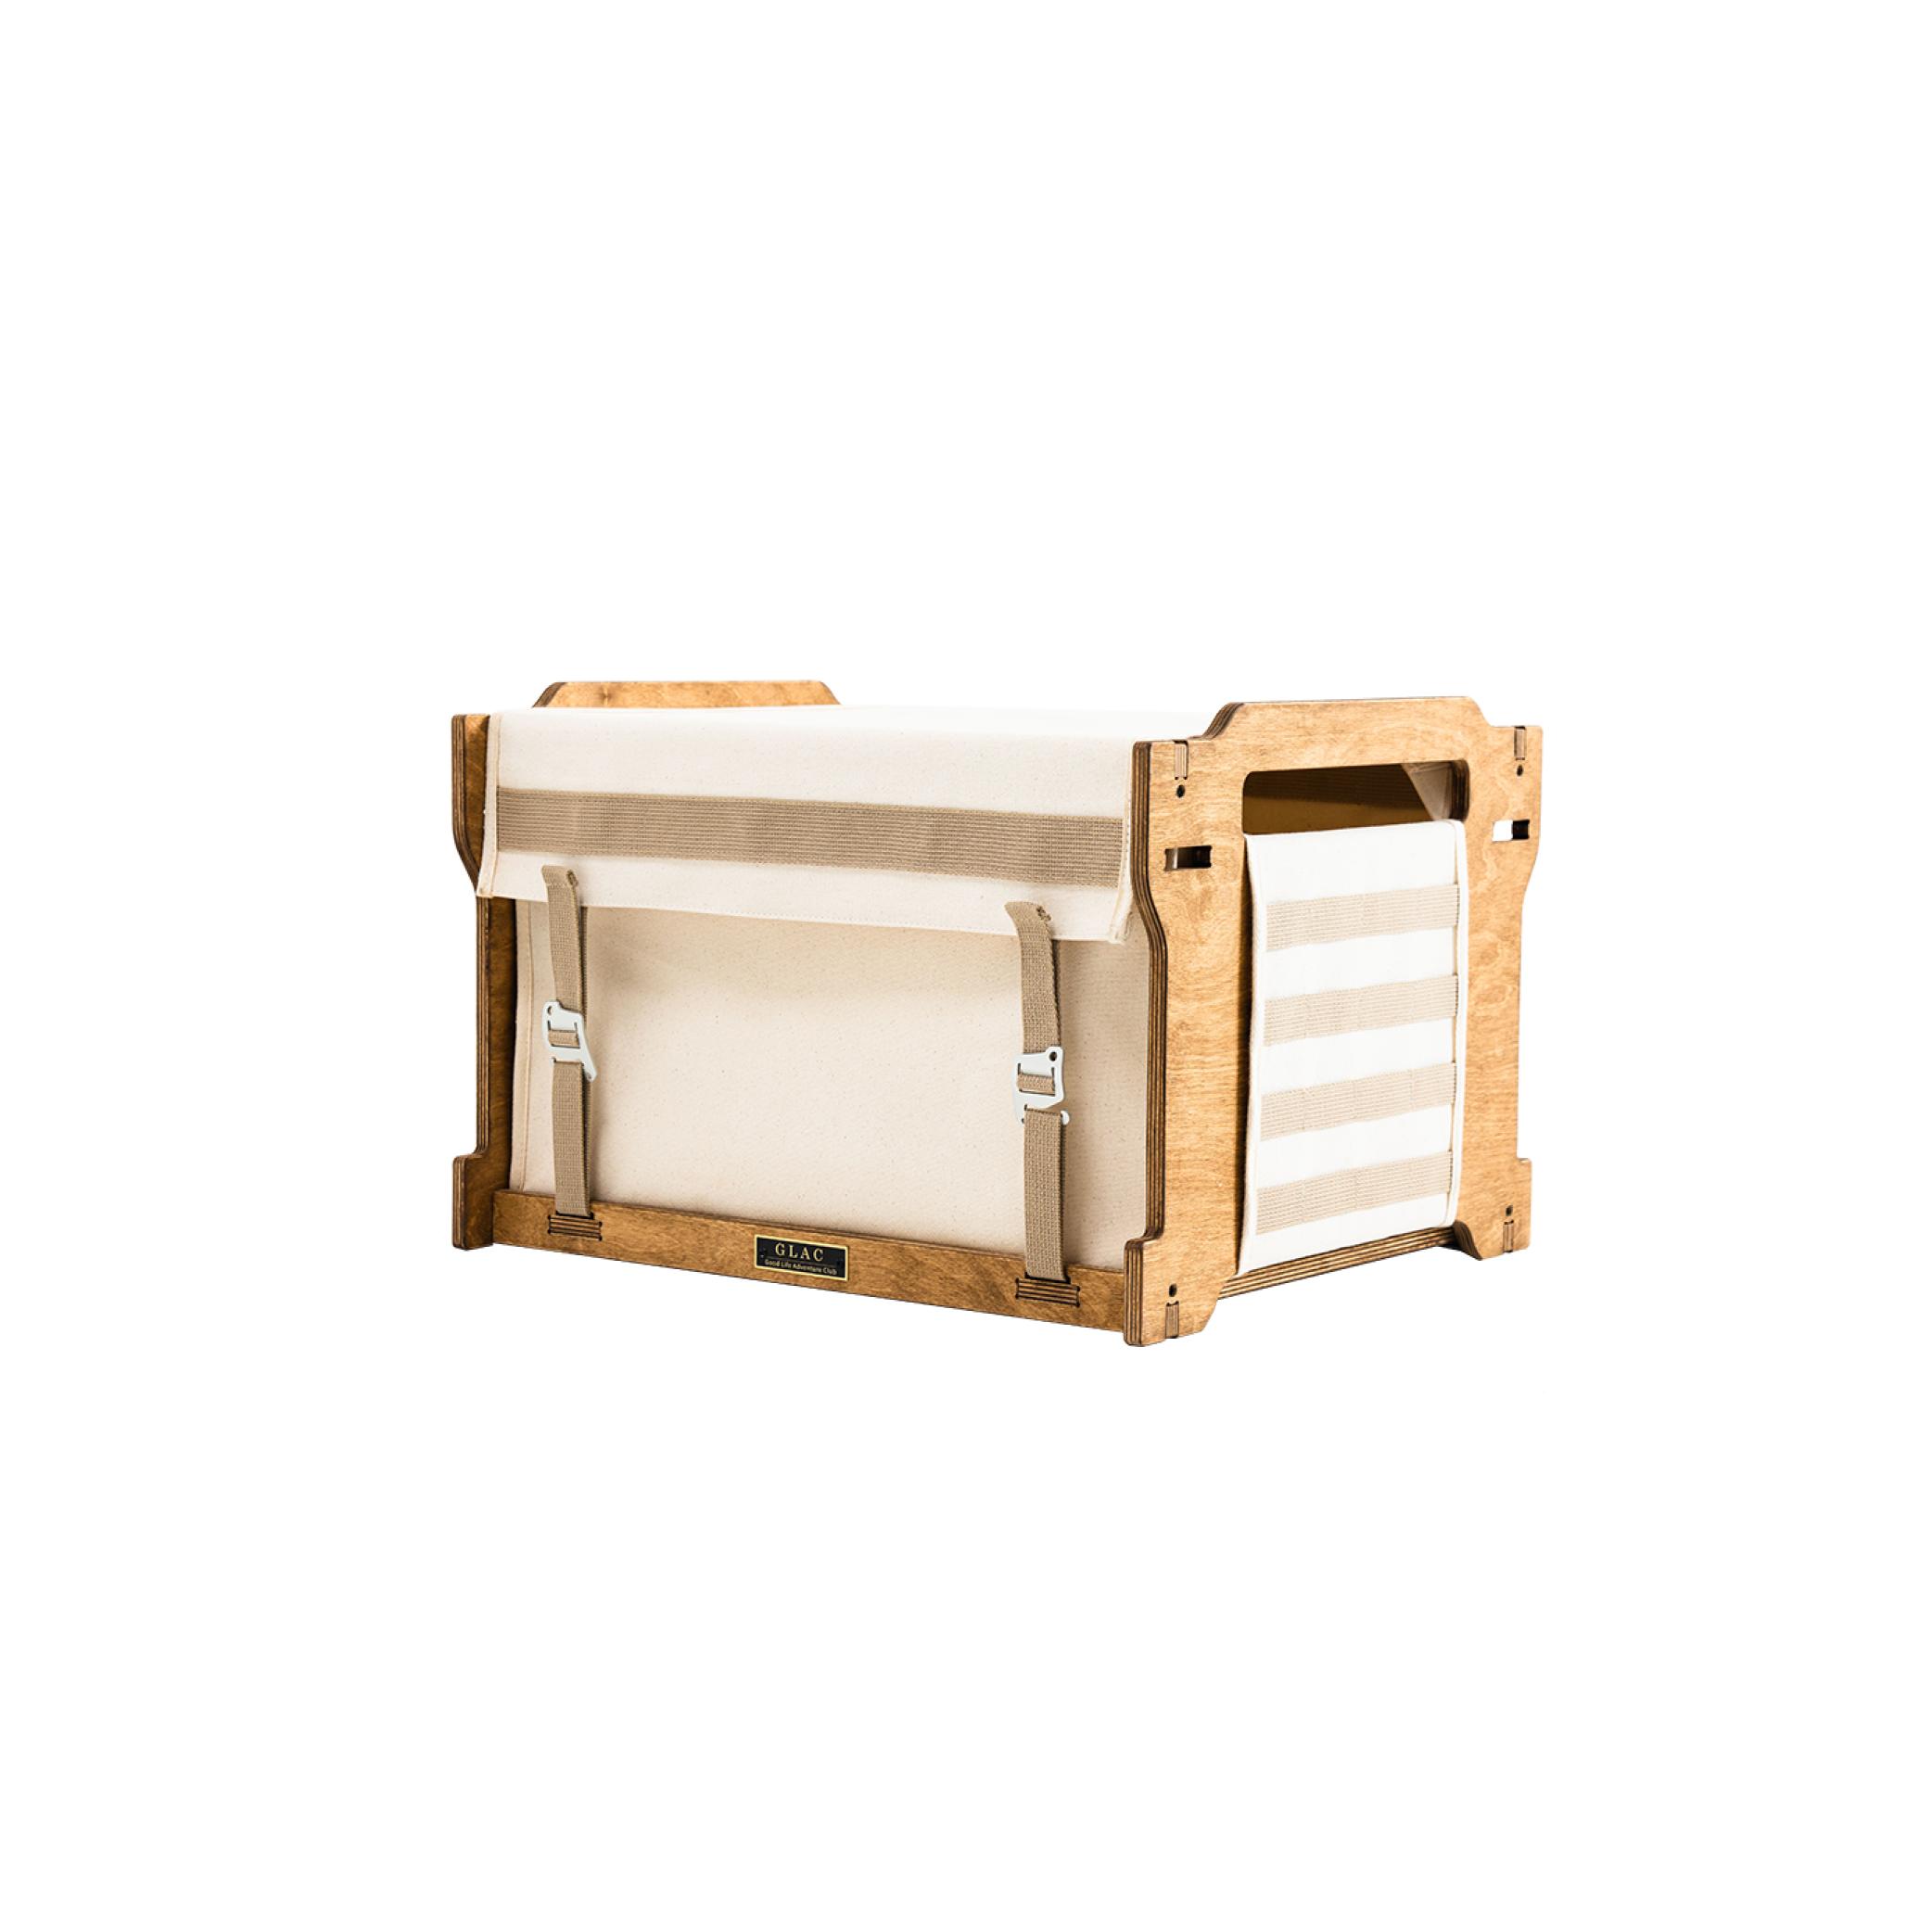 GLAC Crate 25 Camping Box